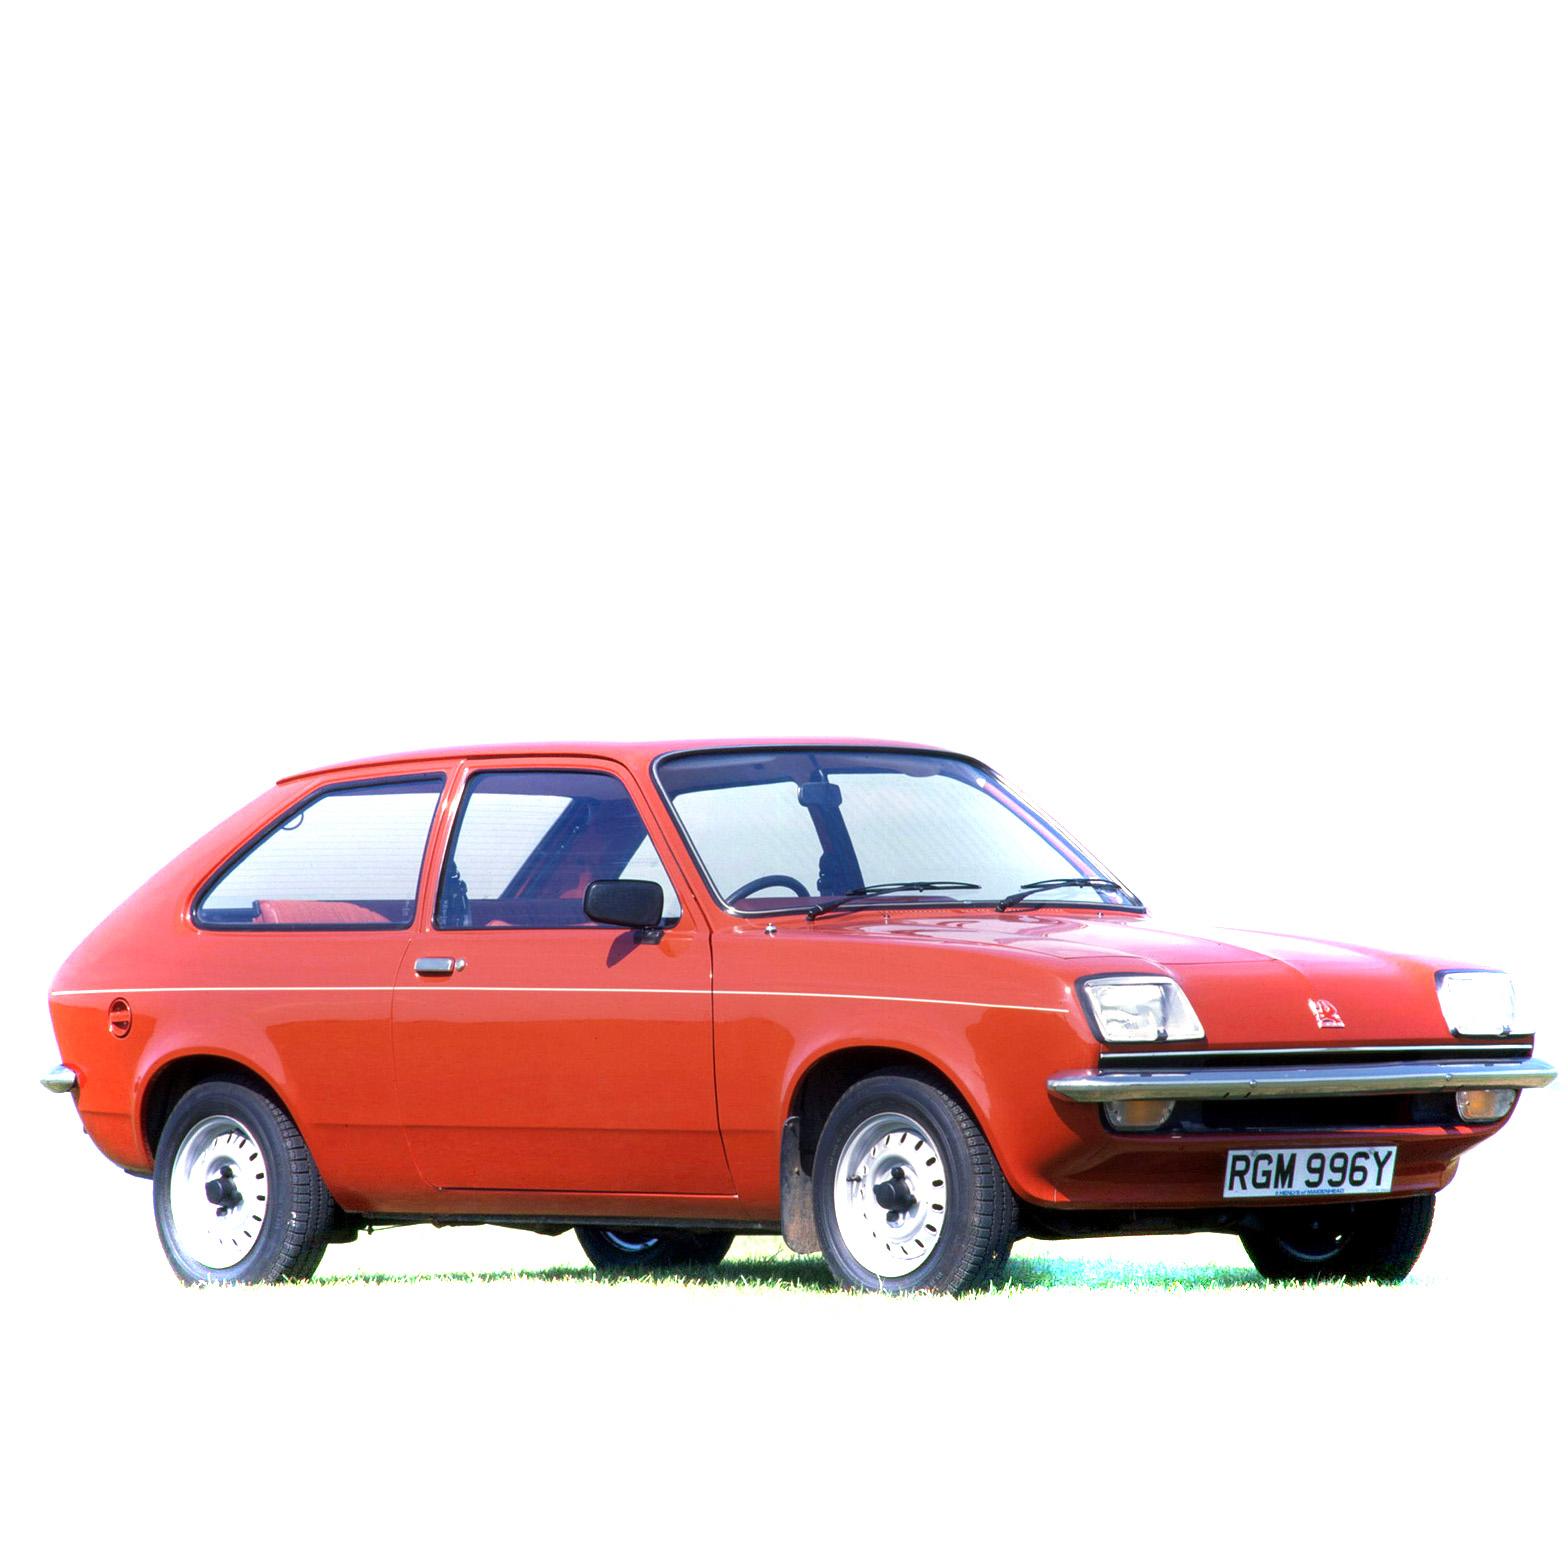 Vauxhall Chevette 1975-1983